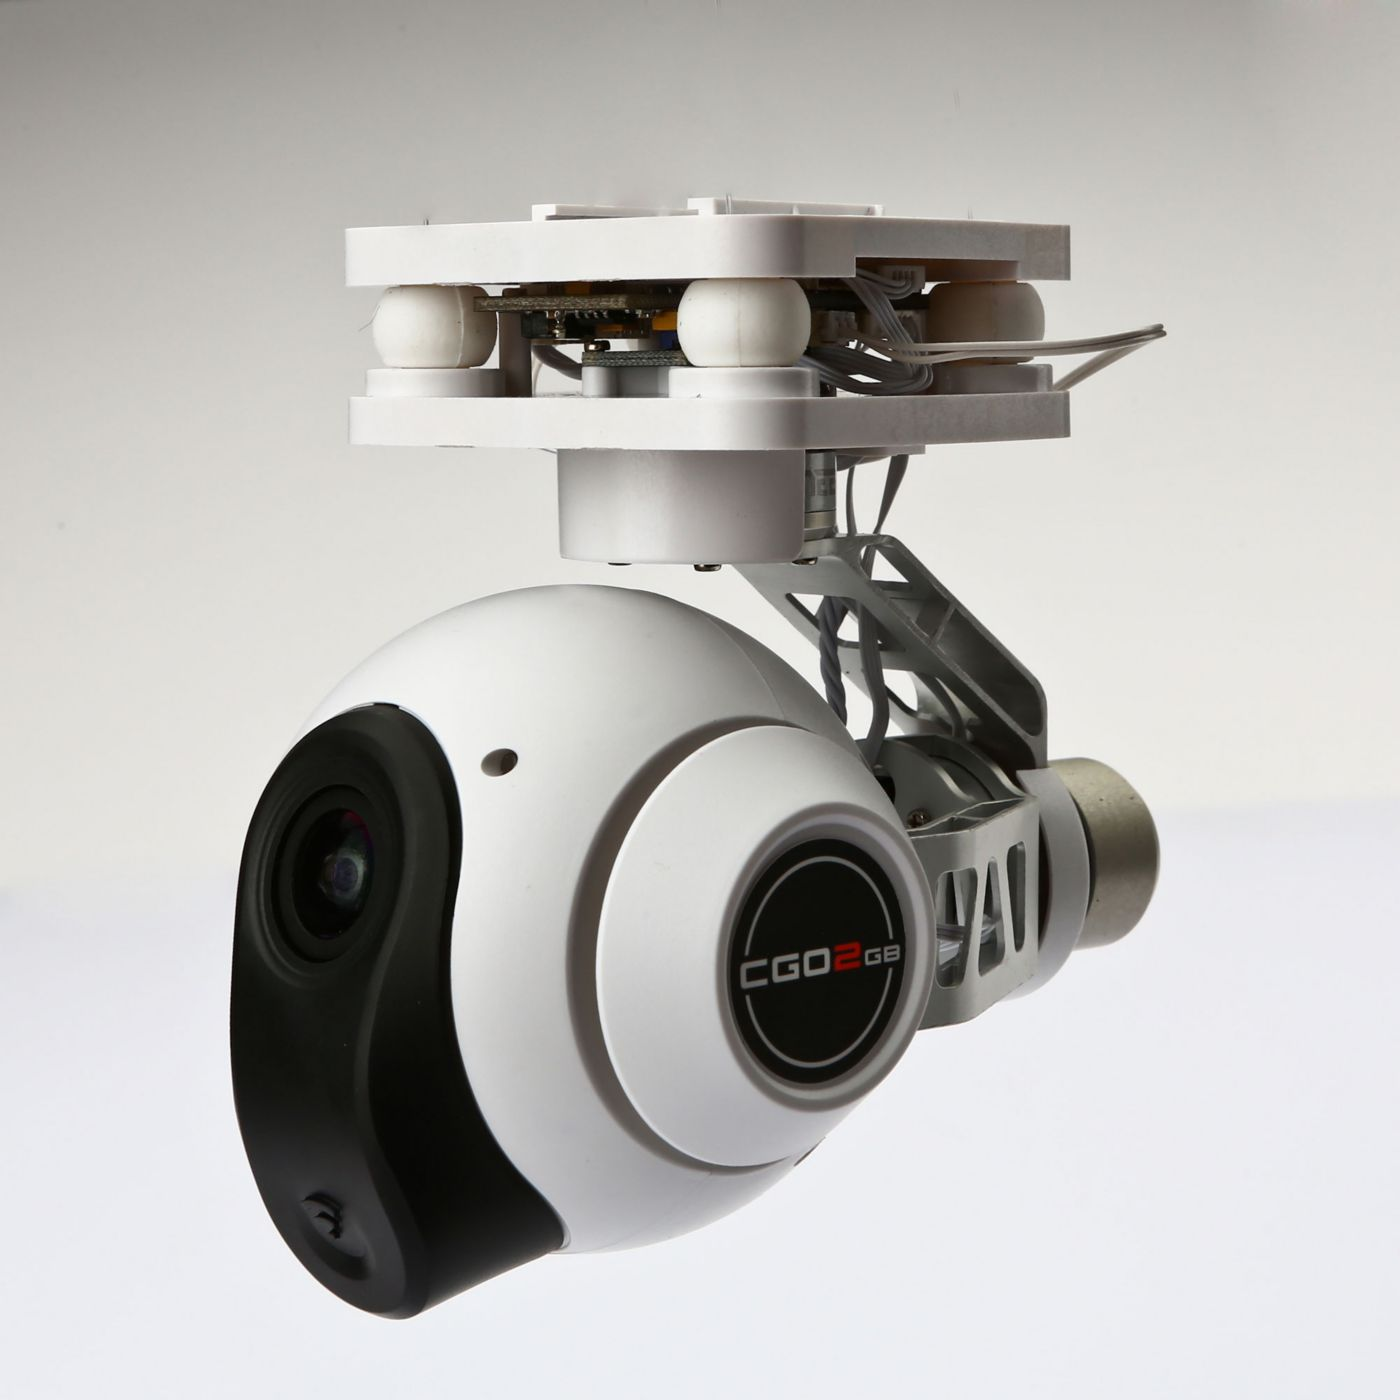 Drivers Update: YUNEEC CGO2GB Camera